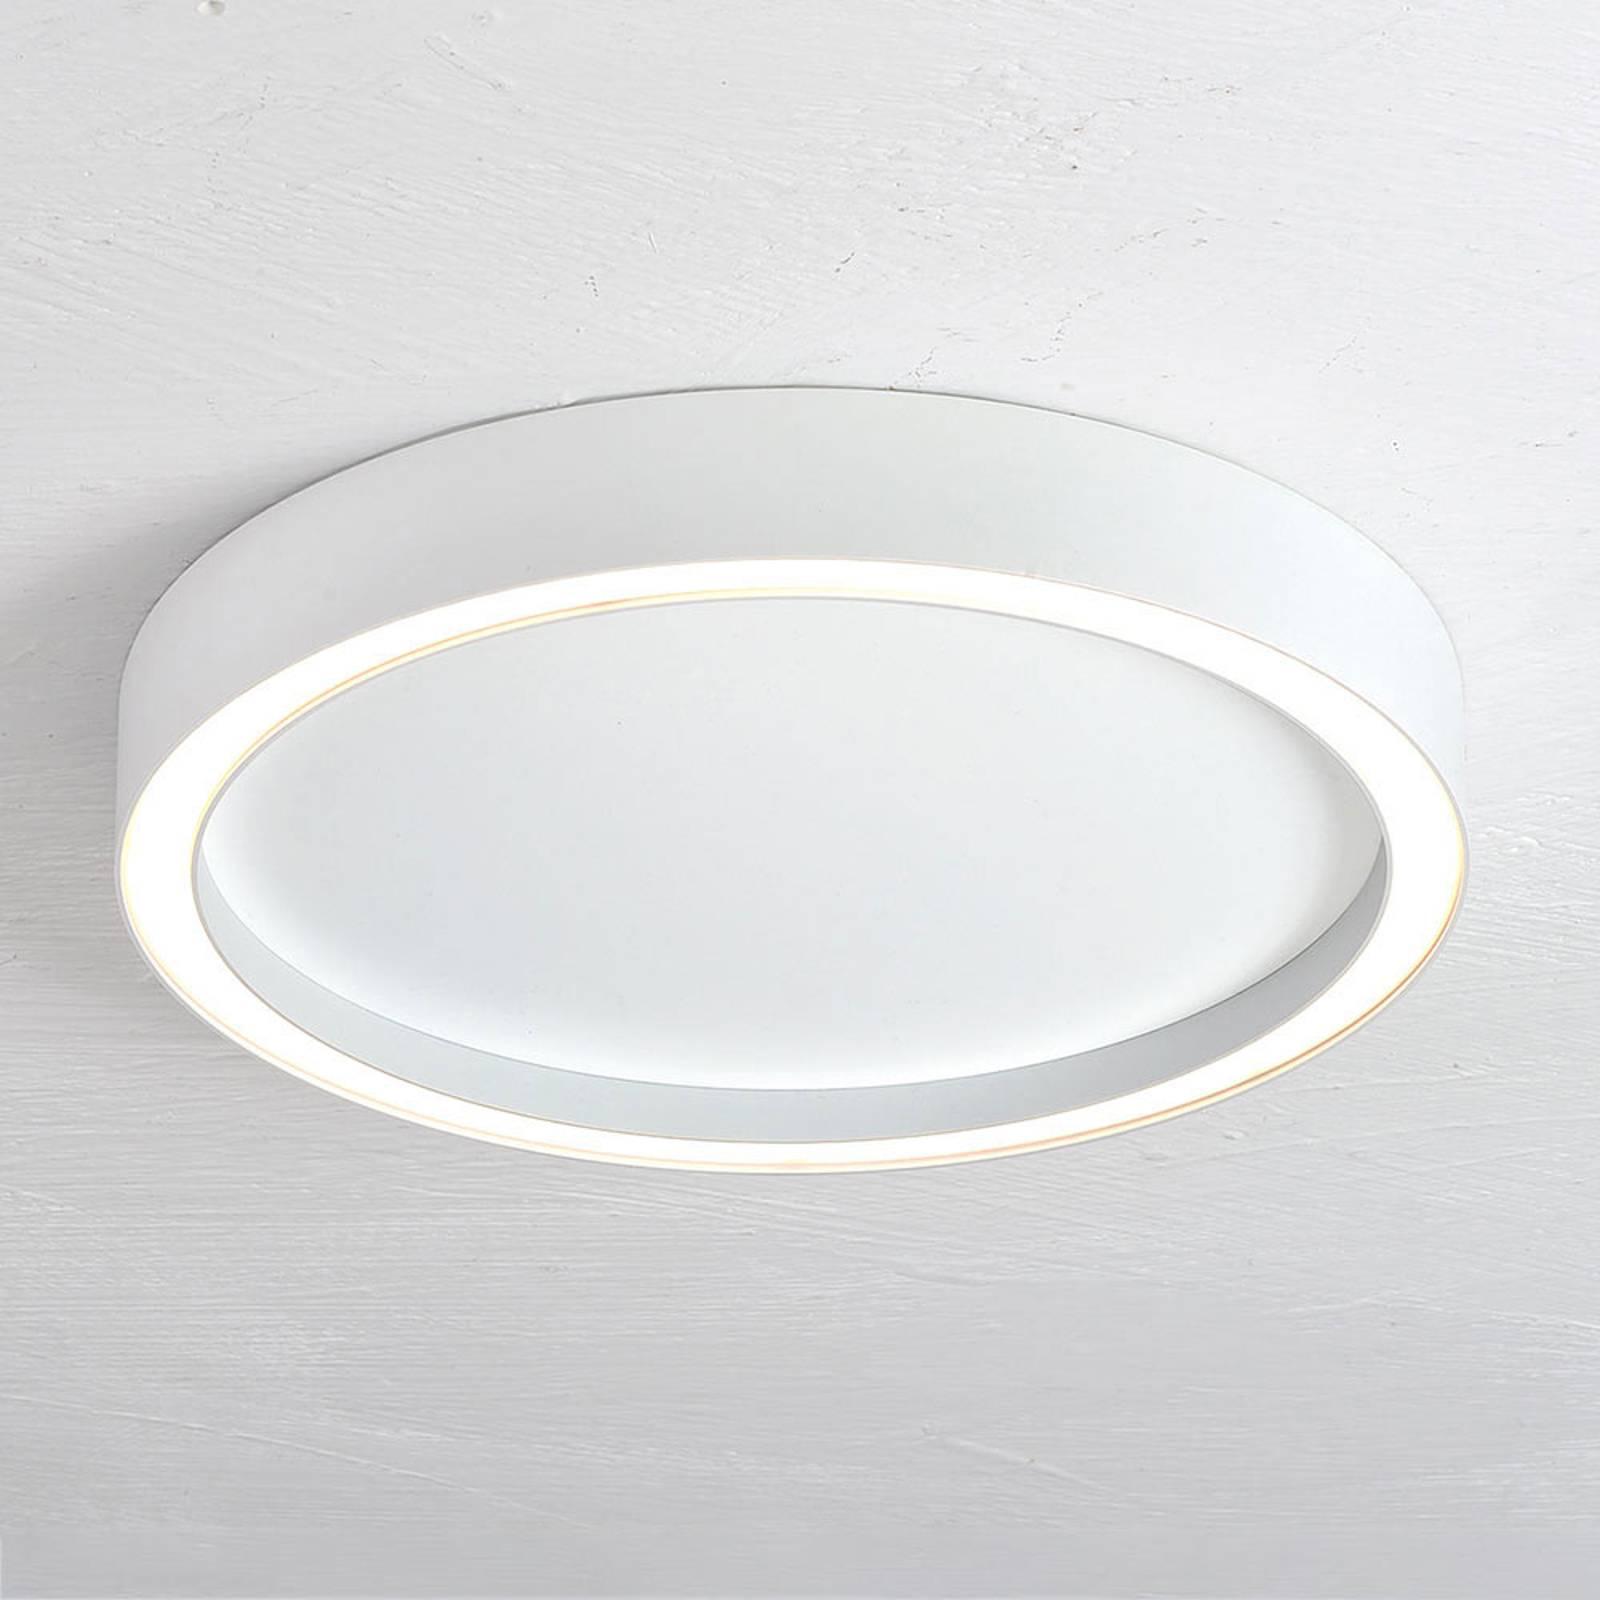 Bopp Aura lampa sufitowa LED Ø 40cm biała/biała